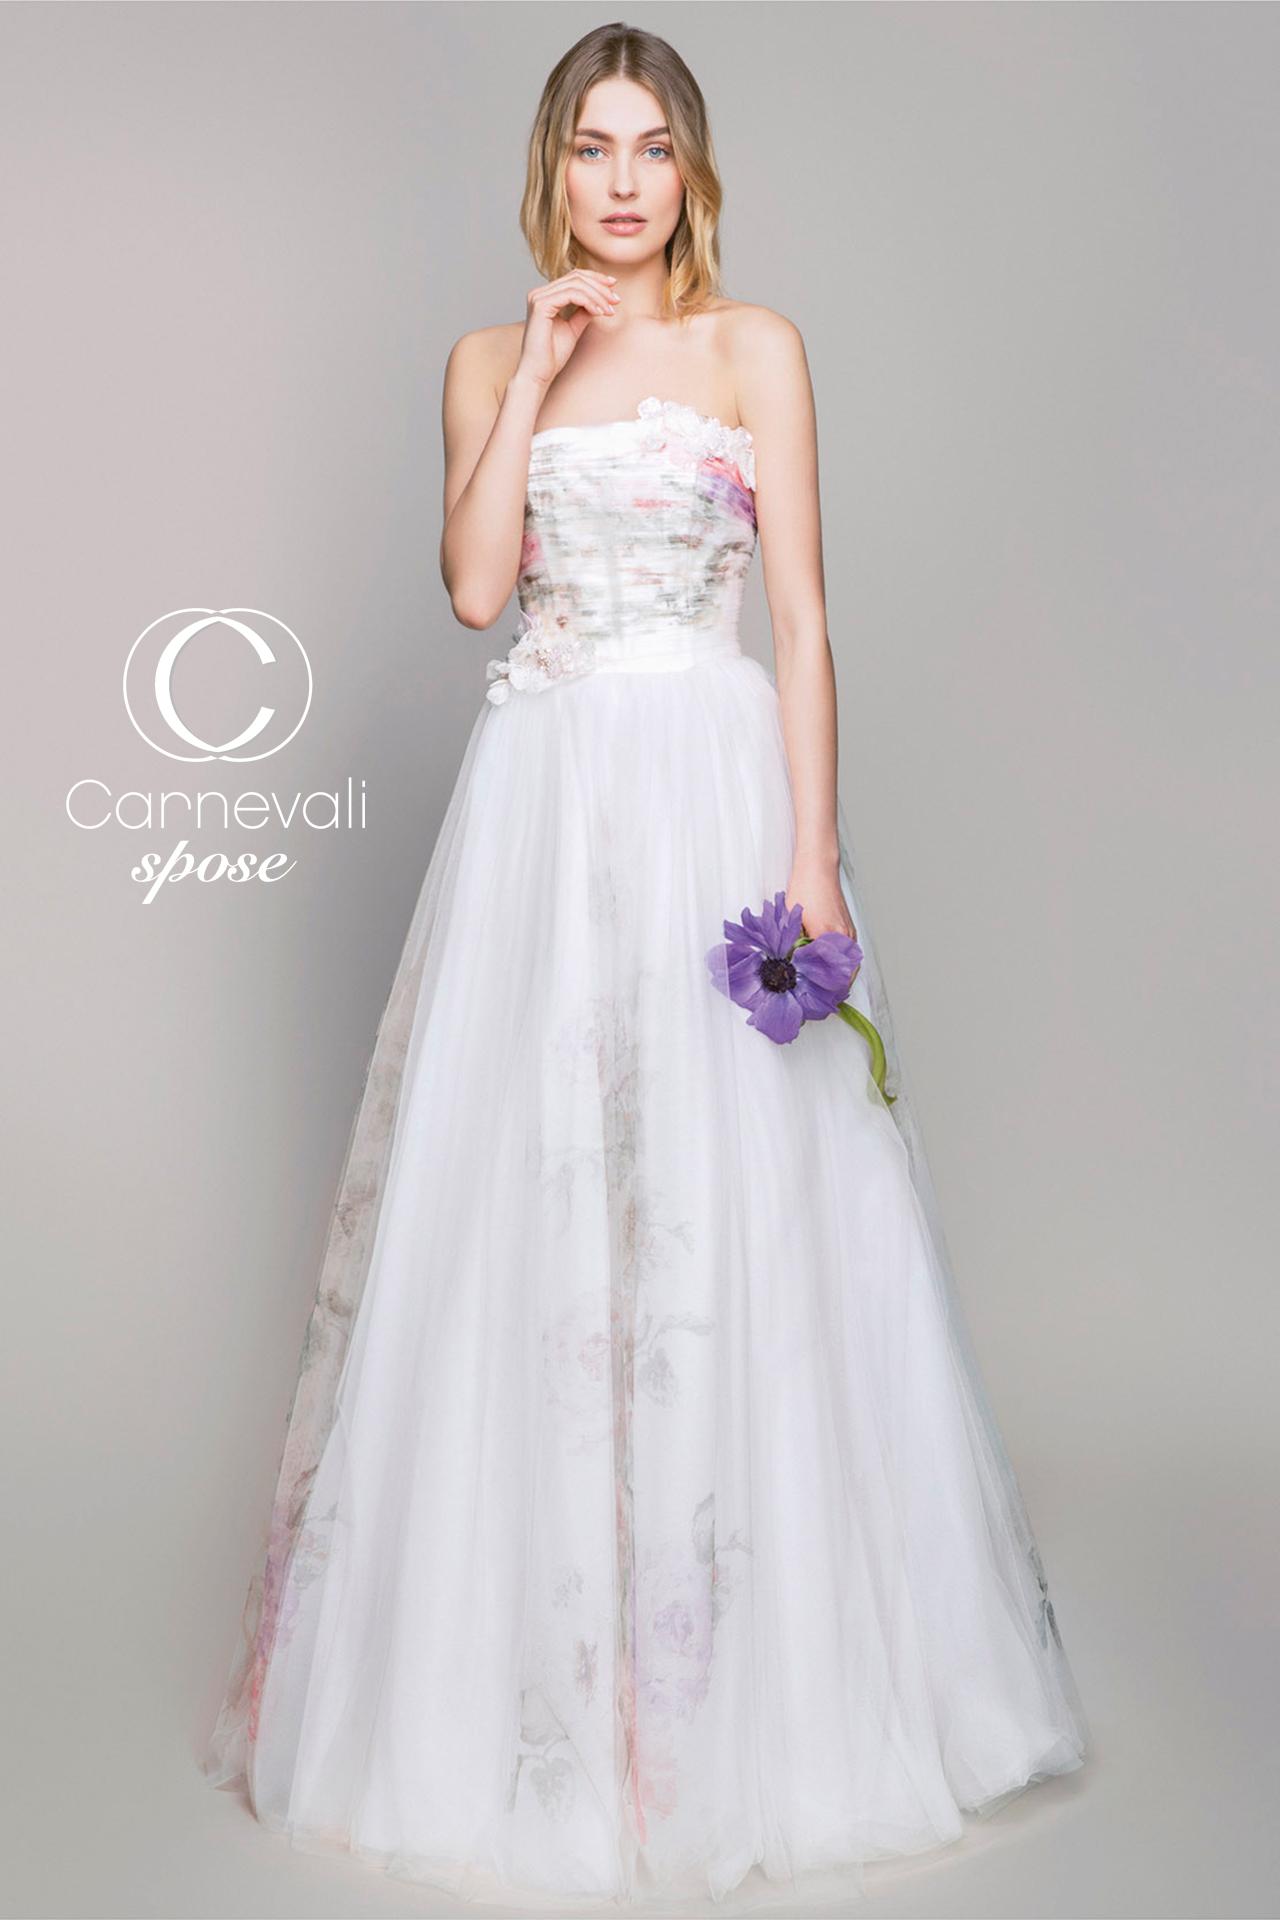 a1af953c2cb1 BLUMARINE 6775 - Carnevali Spose